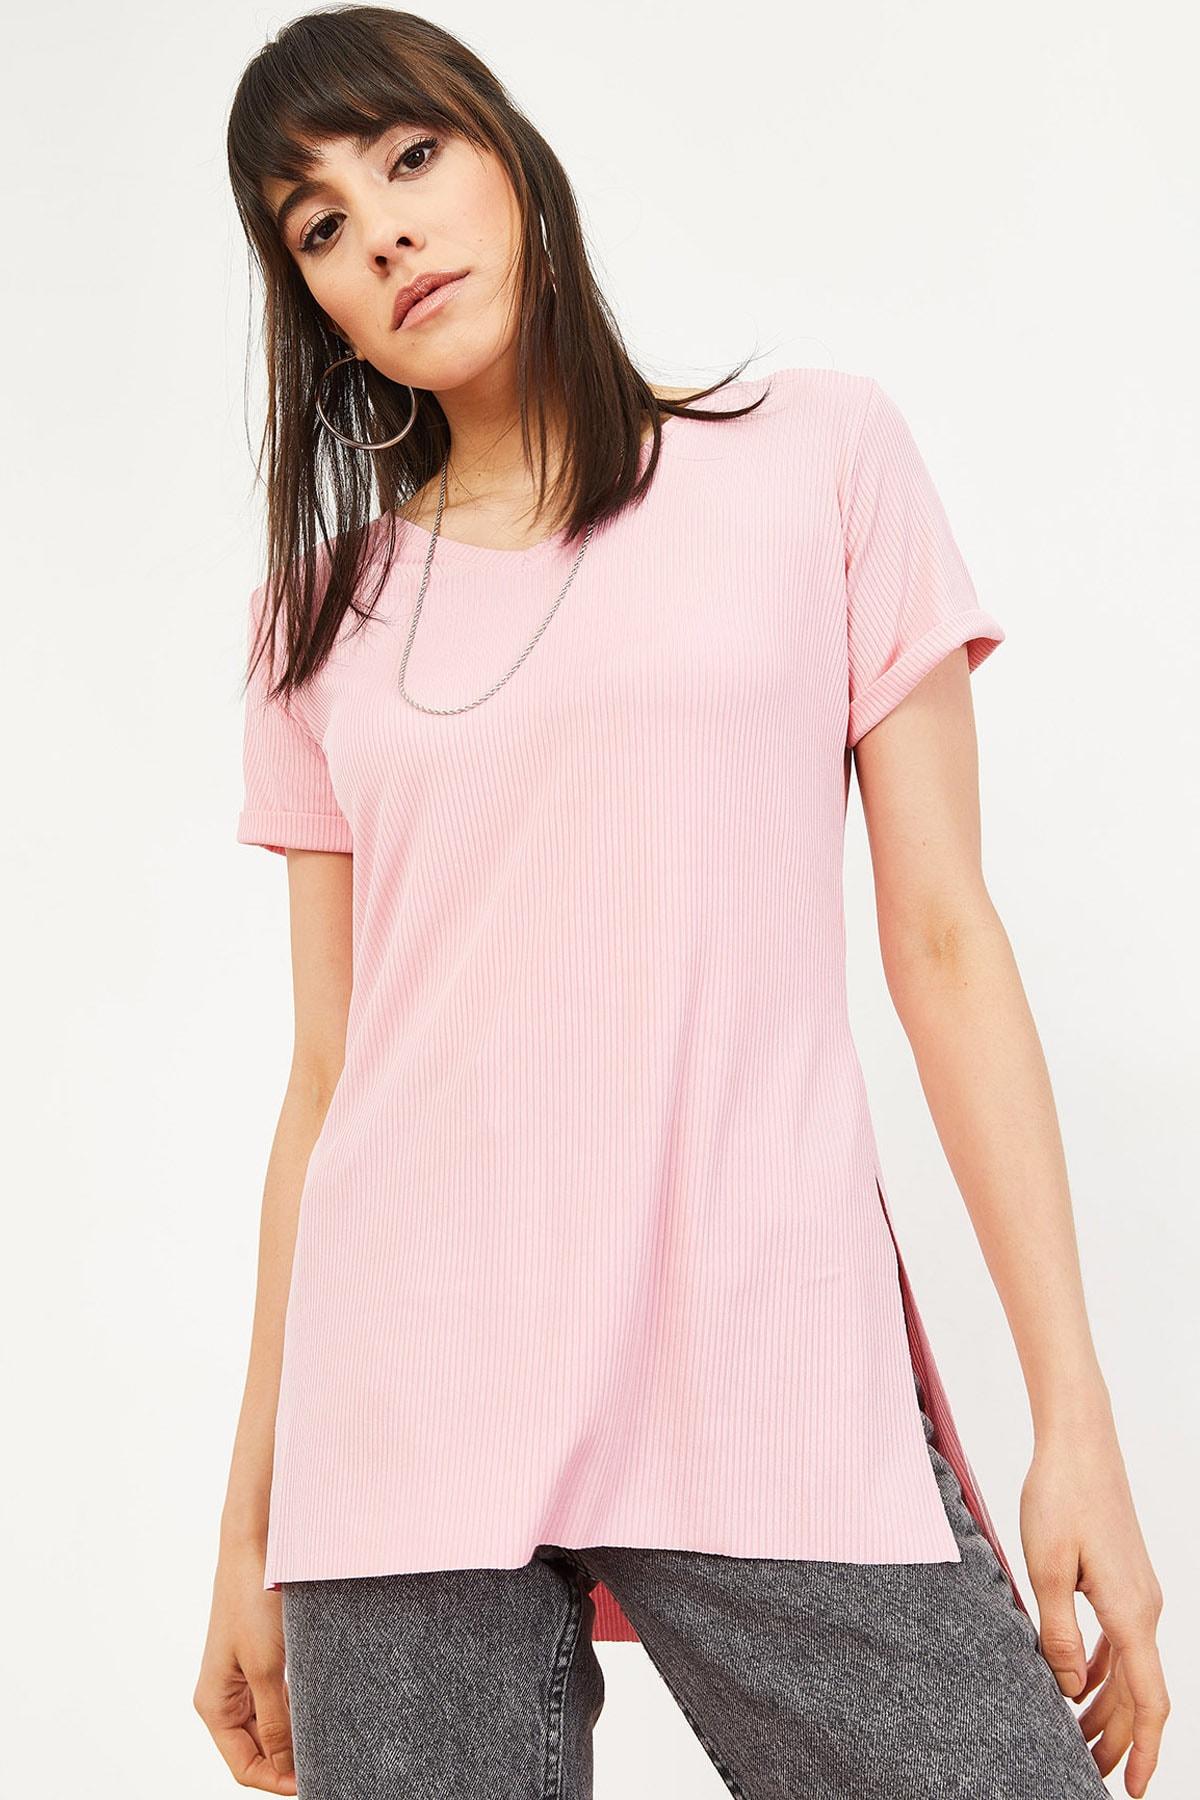 Bianco Lucci Kadın Pudra Kol Yan Yırtmaçlı Kol Detay Kaşkorse T-Shirt 10051012 4